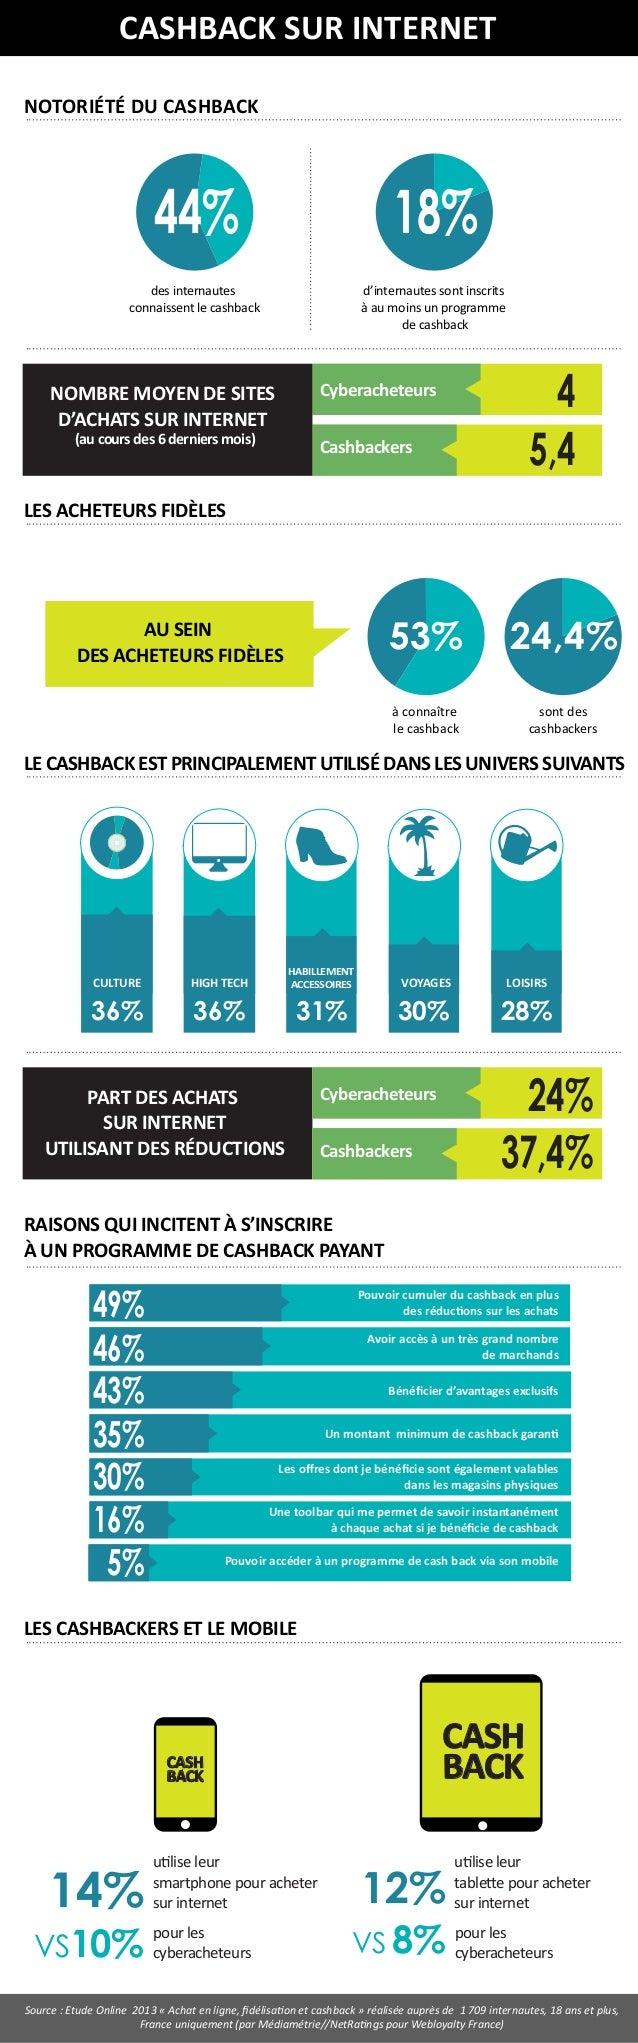 Le cash-back gagnant sur Internet en France par Webloyalty.fr